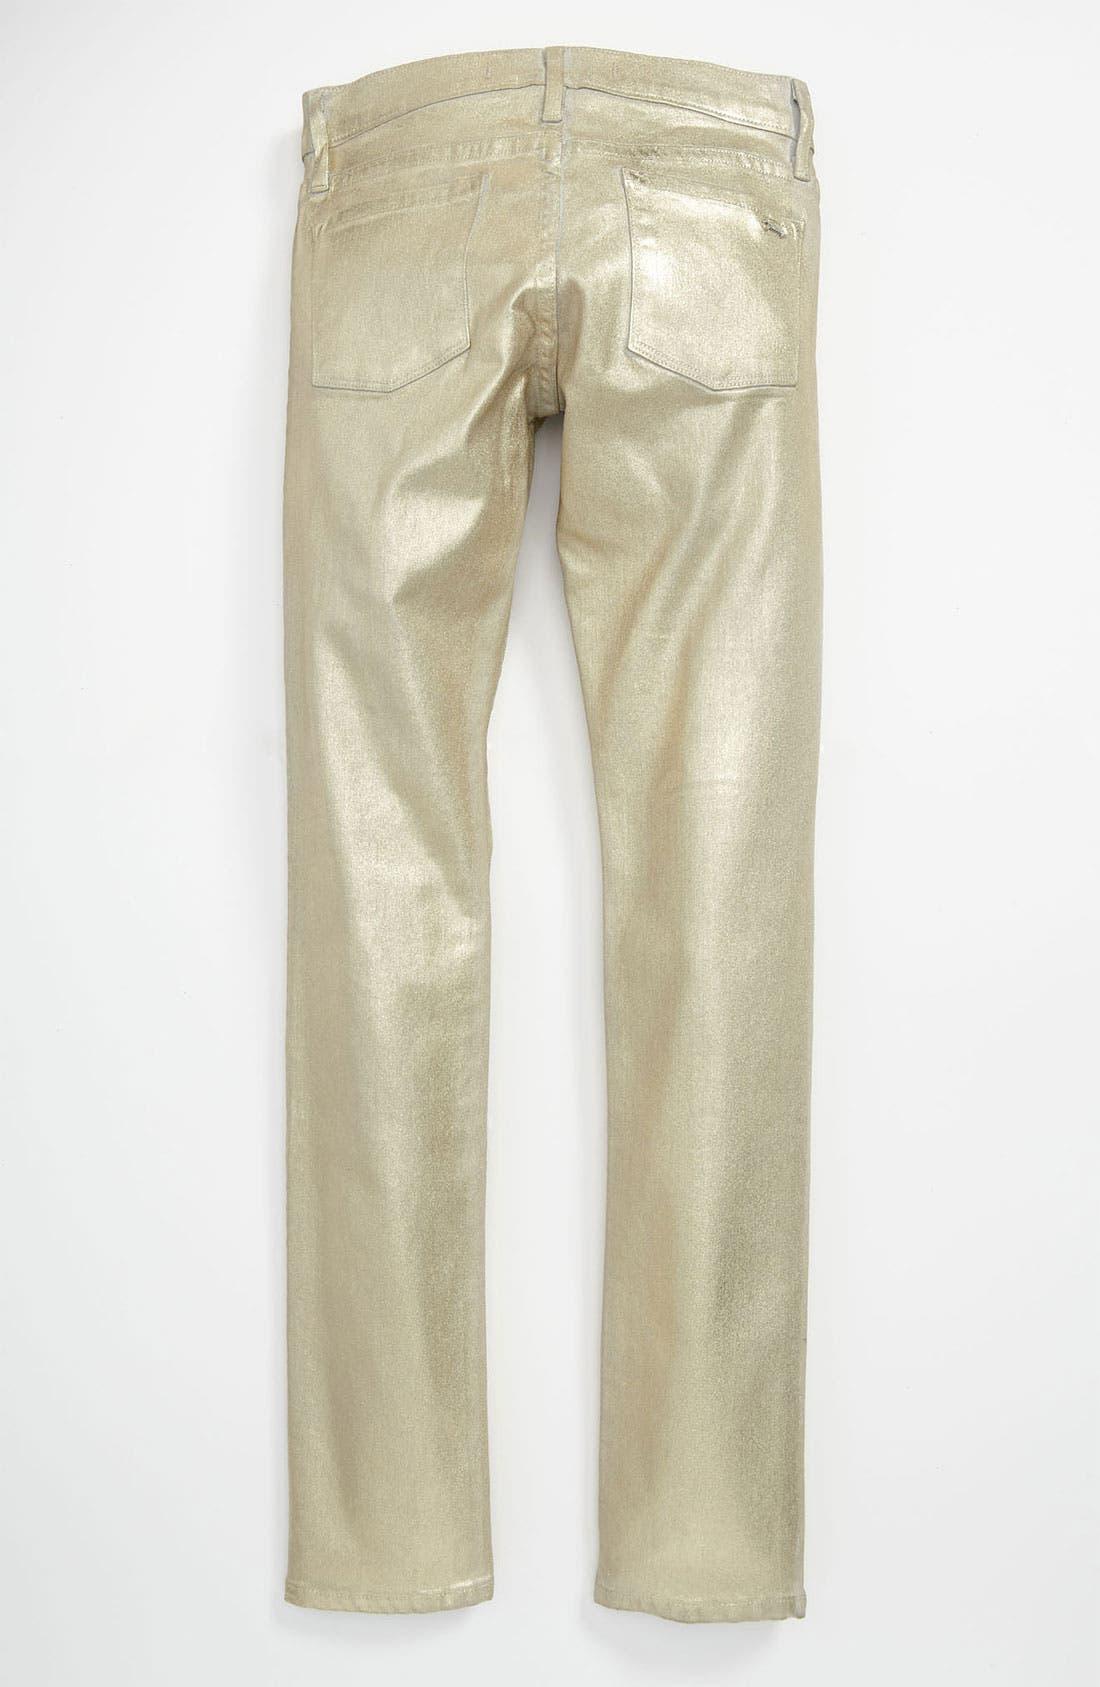 Main Image - Juicy Couture Metallic Skinny Pants (Little Girls & Big Girls)